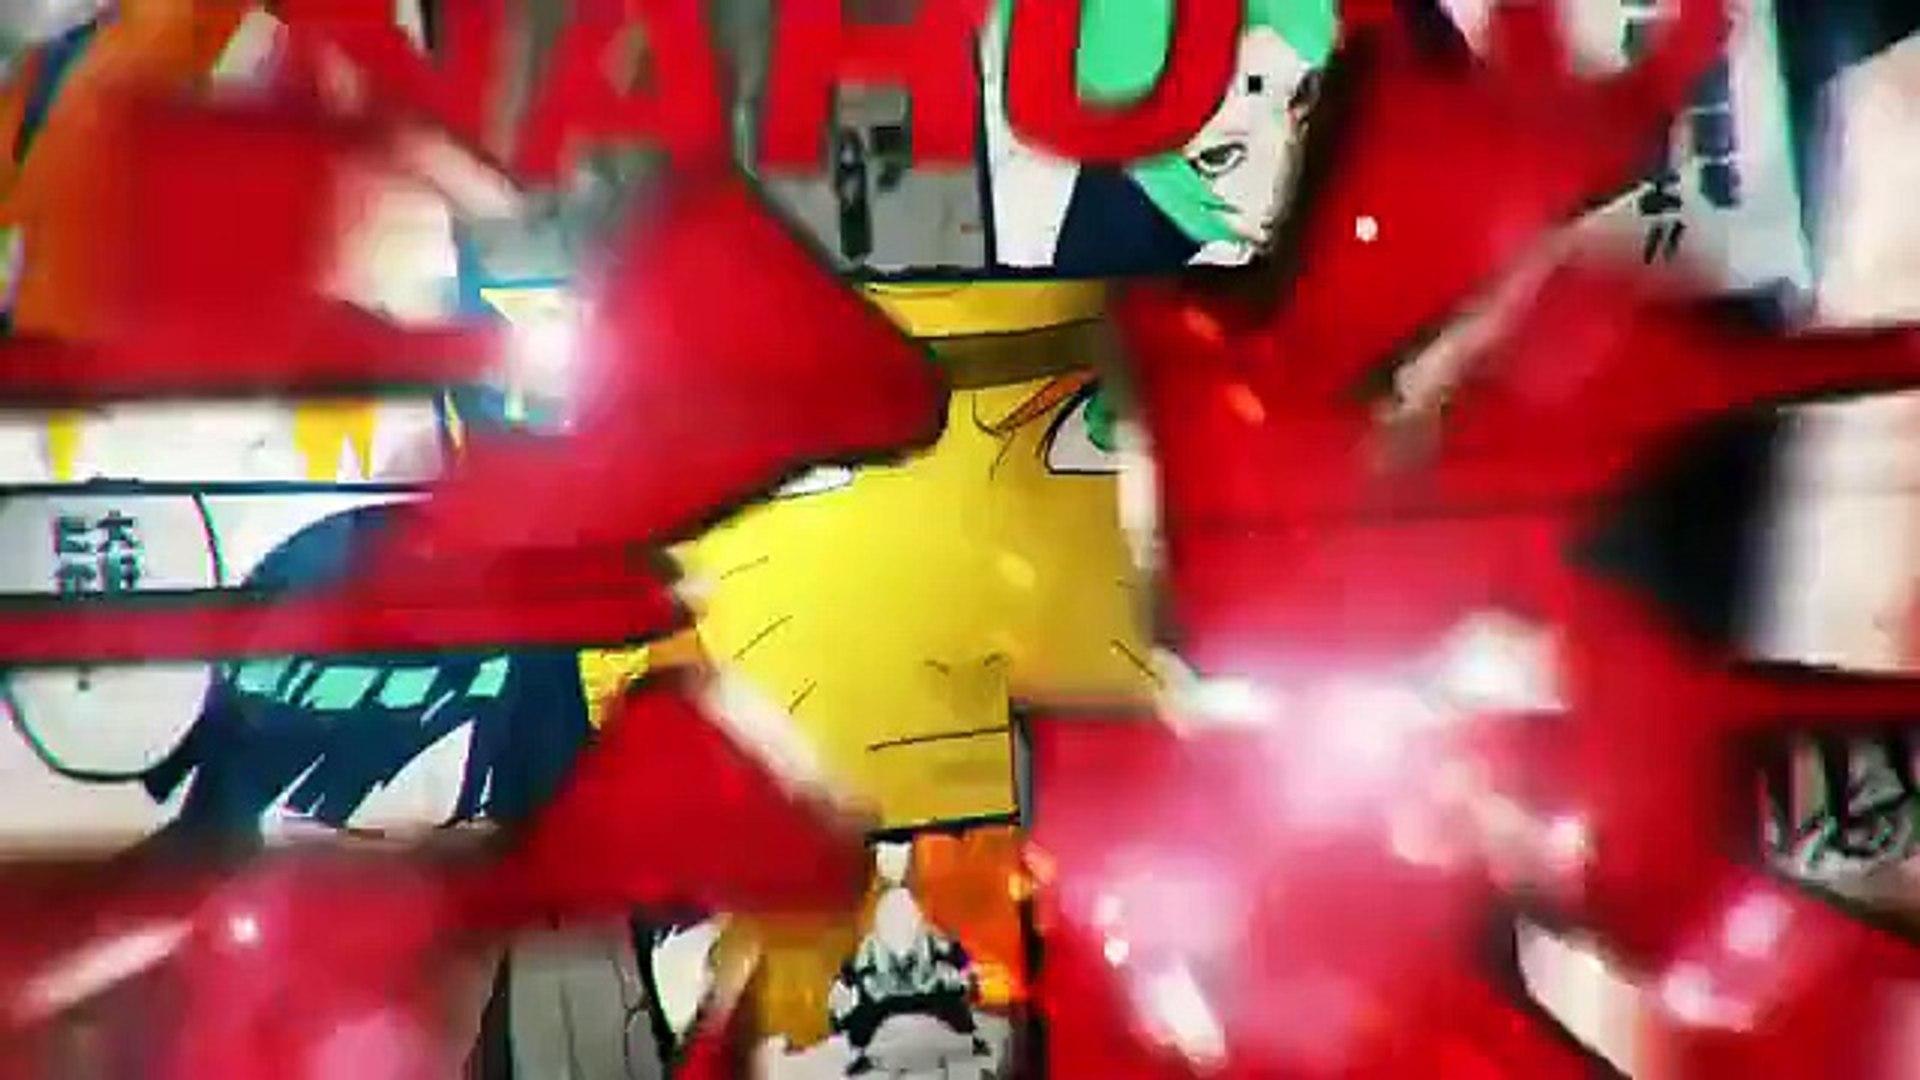 Наруто 10 фильм   Наруто Последний Фильм   The Last Naruto The Movie [Trailer]